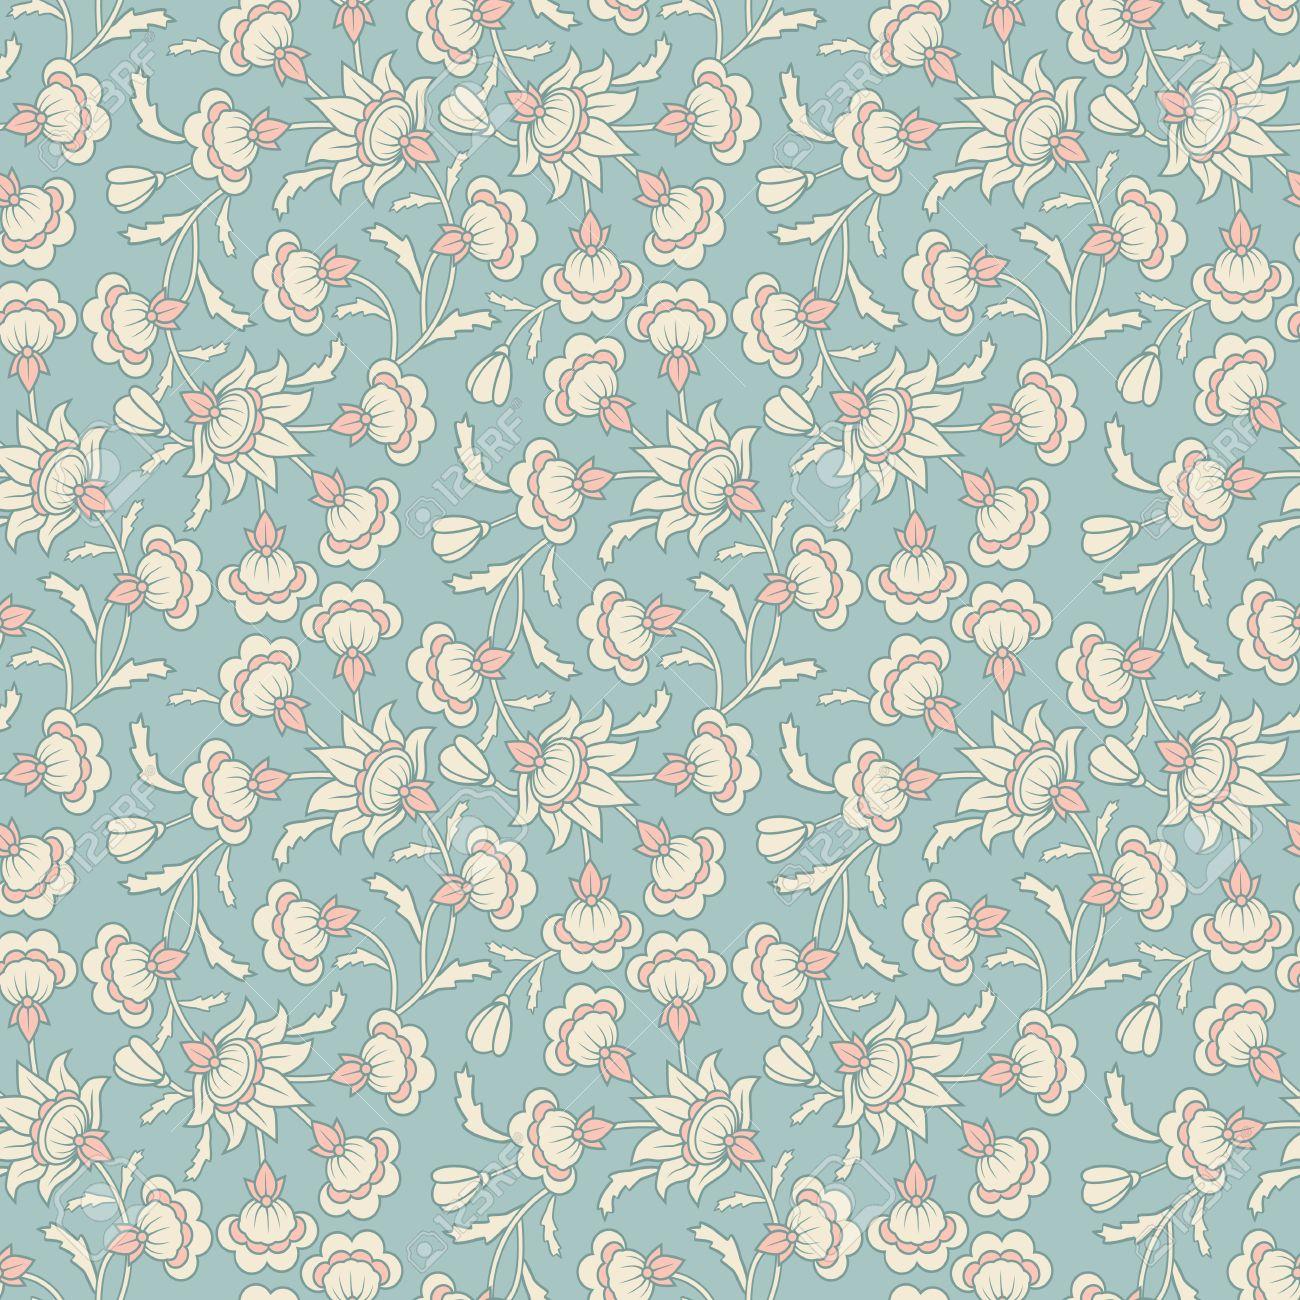 Vintage Vector Seamless Floral Damask Wallpaper Pattern Royalty